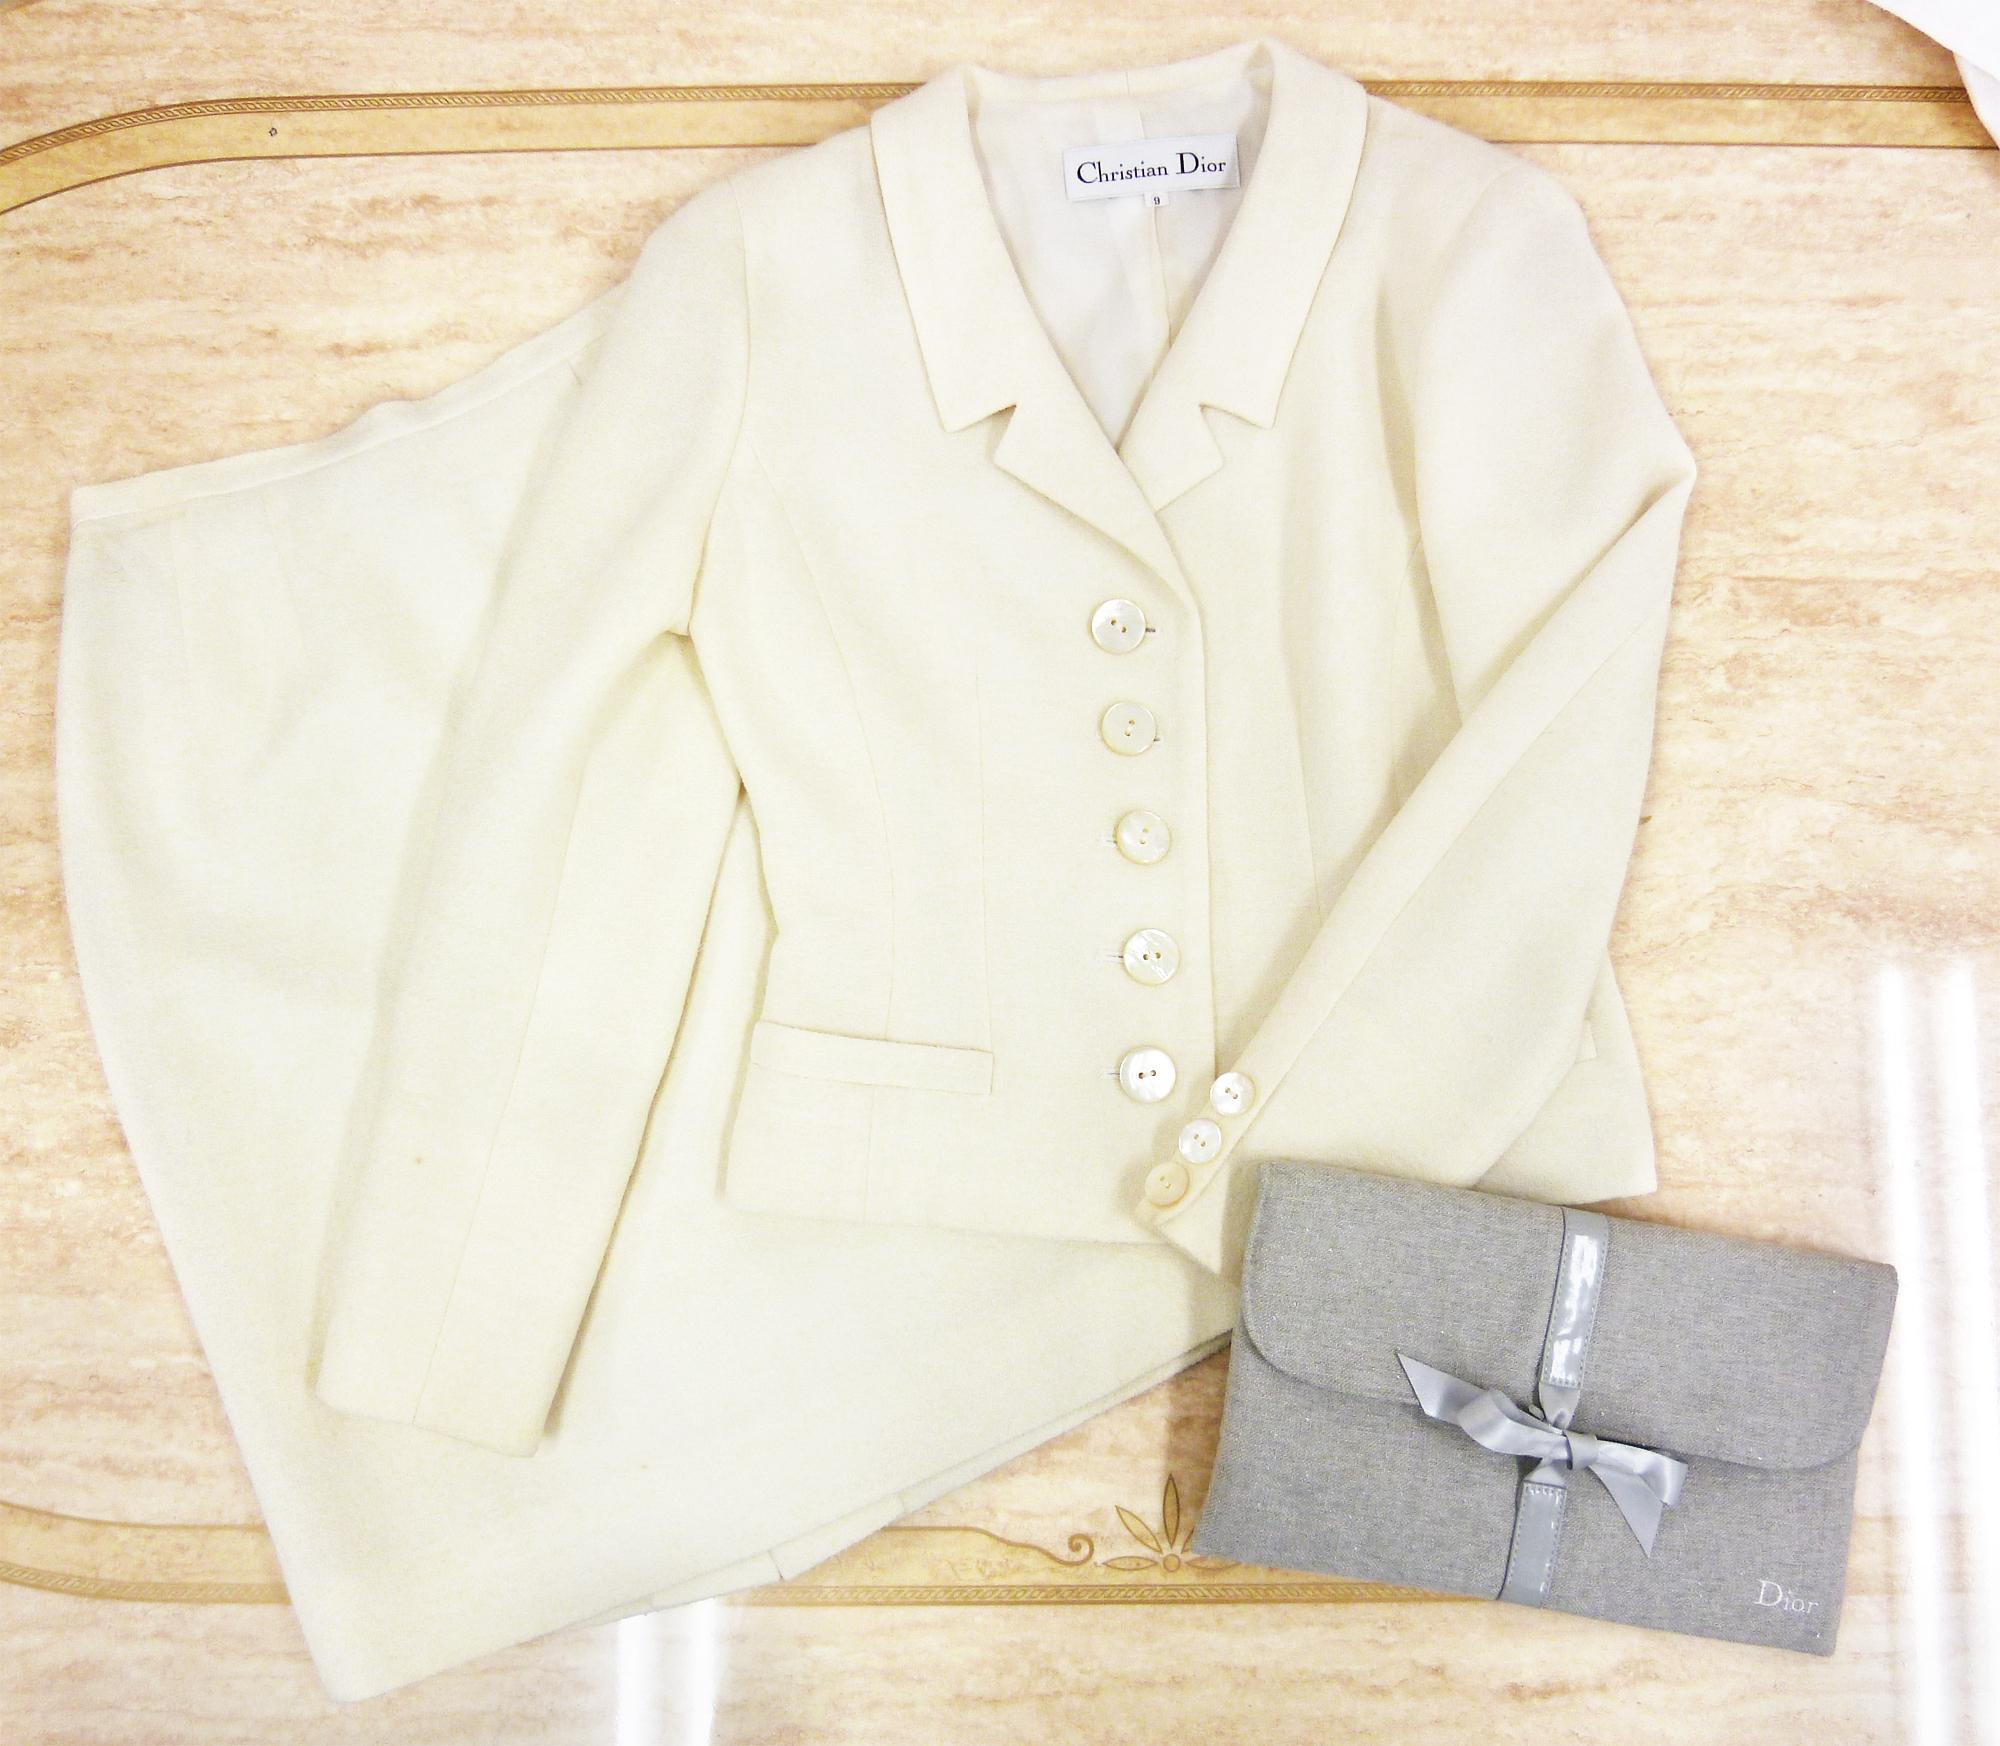 Christian Dior(クリスチャン・ディオール) アイボリー レディース スーツセットアップ(ジャケット&スカート)【中古/良品】の商品画像